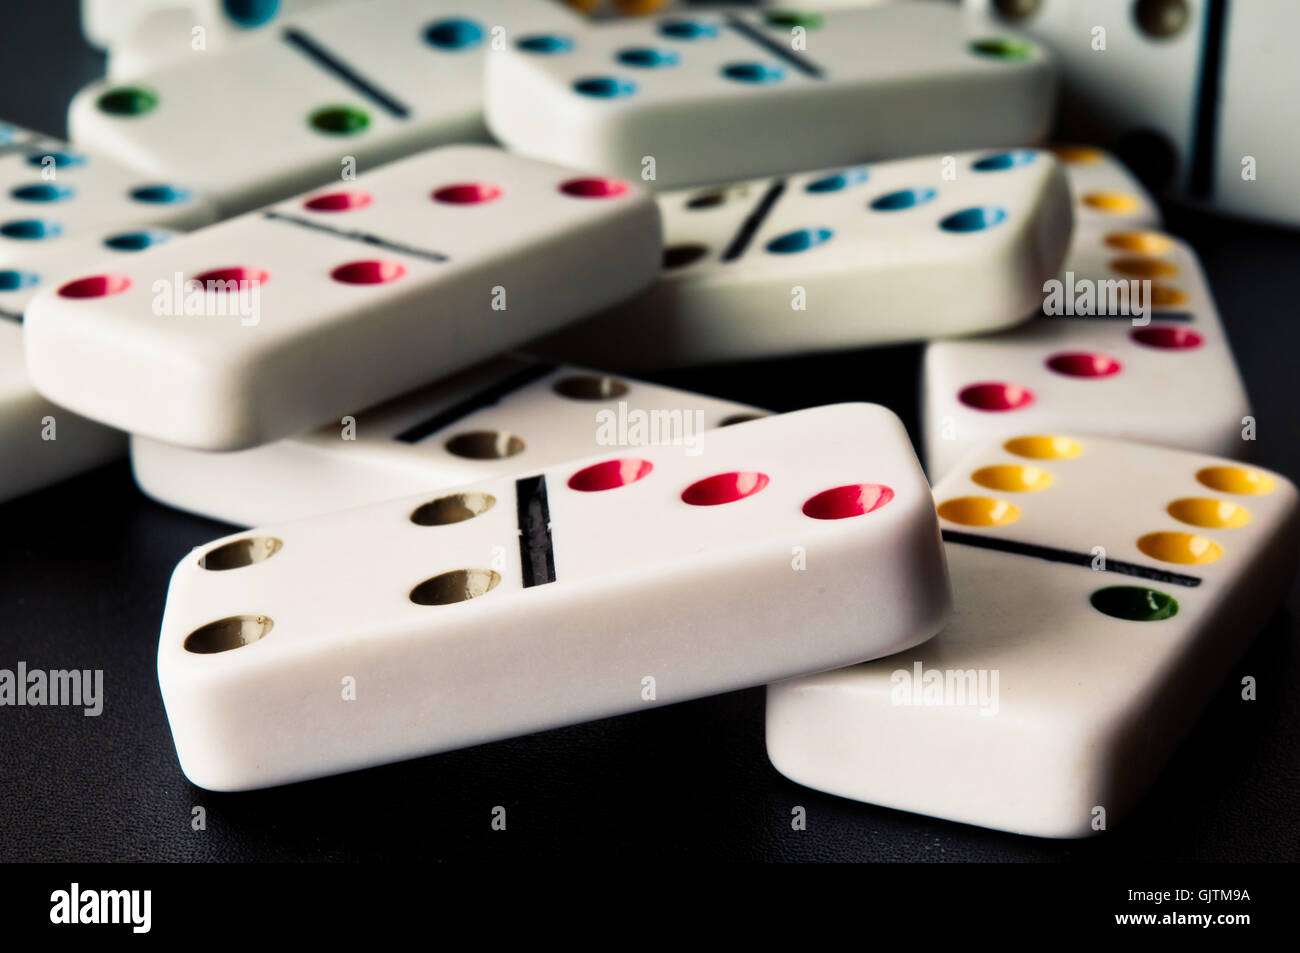 domino tiles - Stock Image